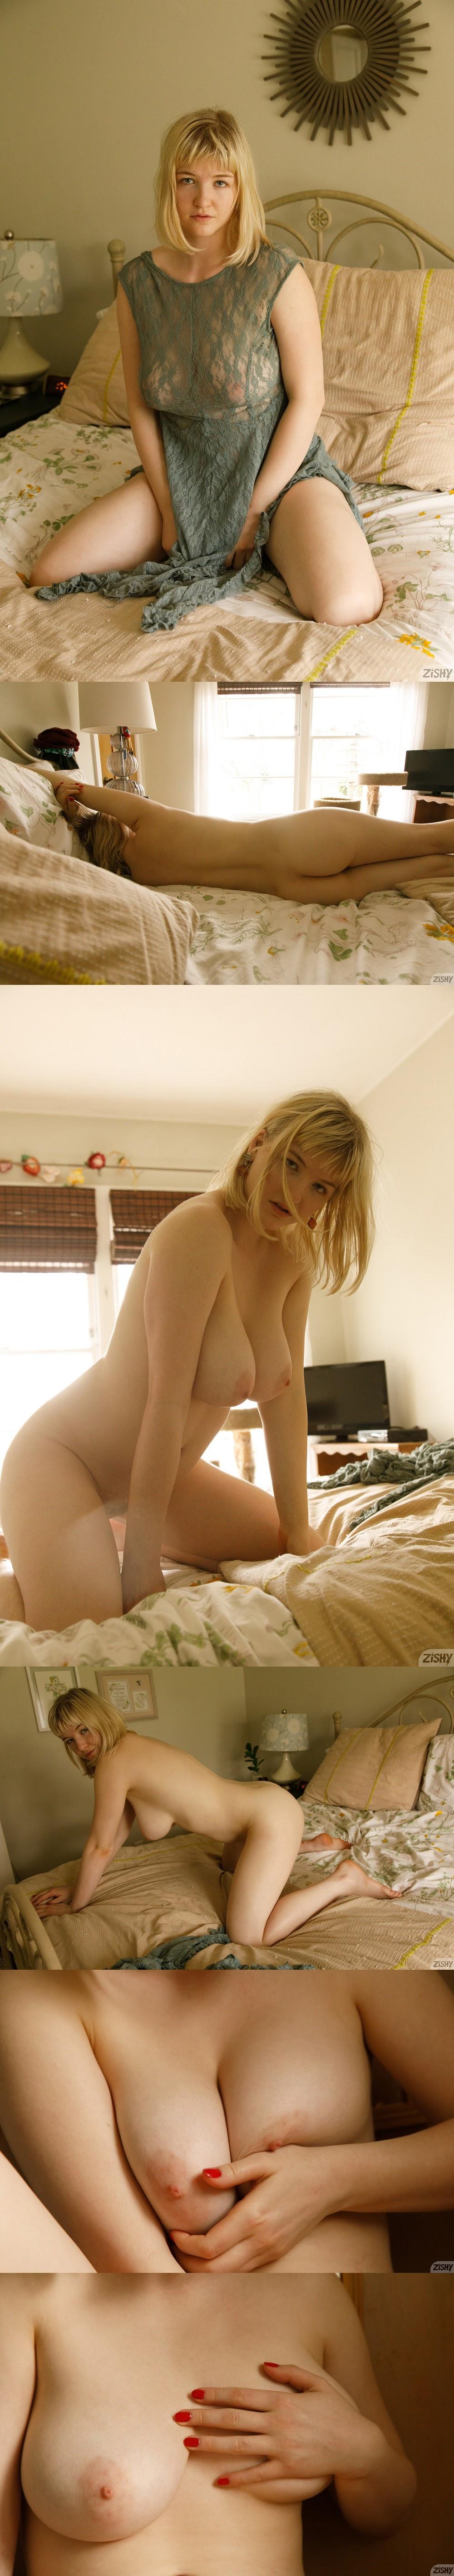 [Zishy] Vicky Chandler - Nature Is Gangsta 1624281371_full_016_1114144729173940